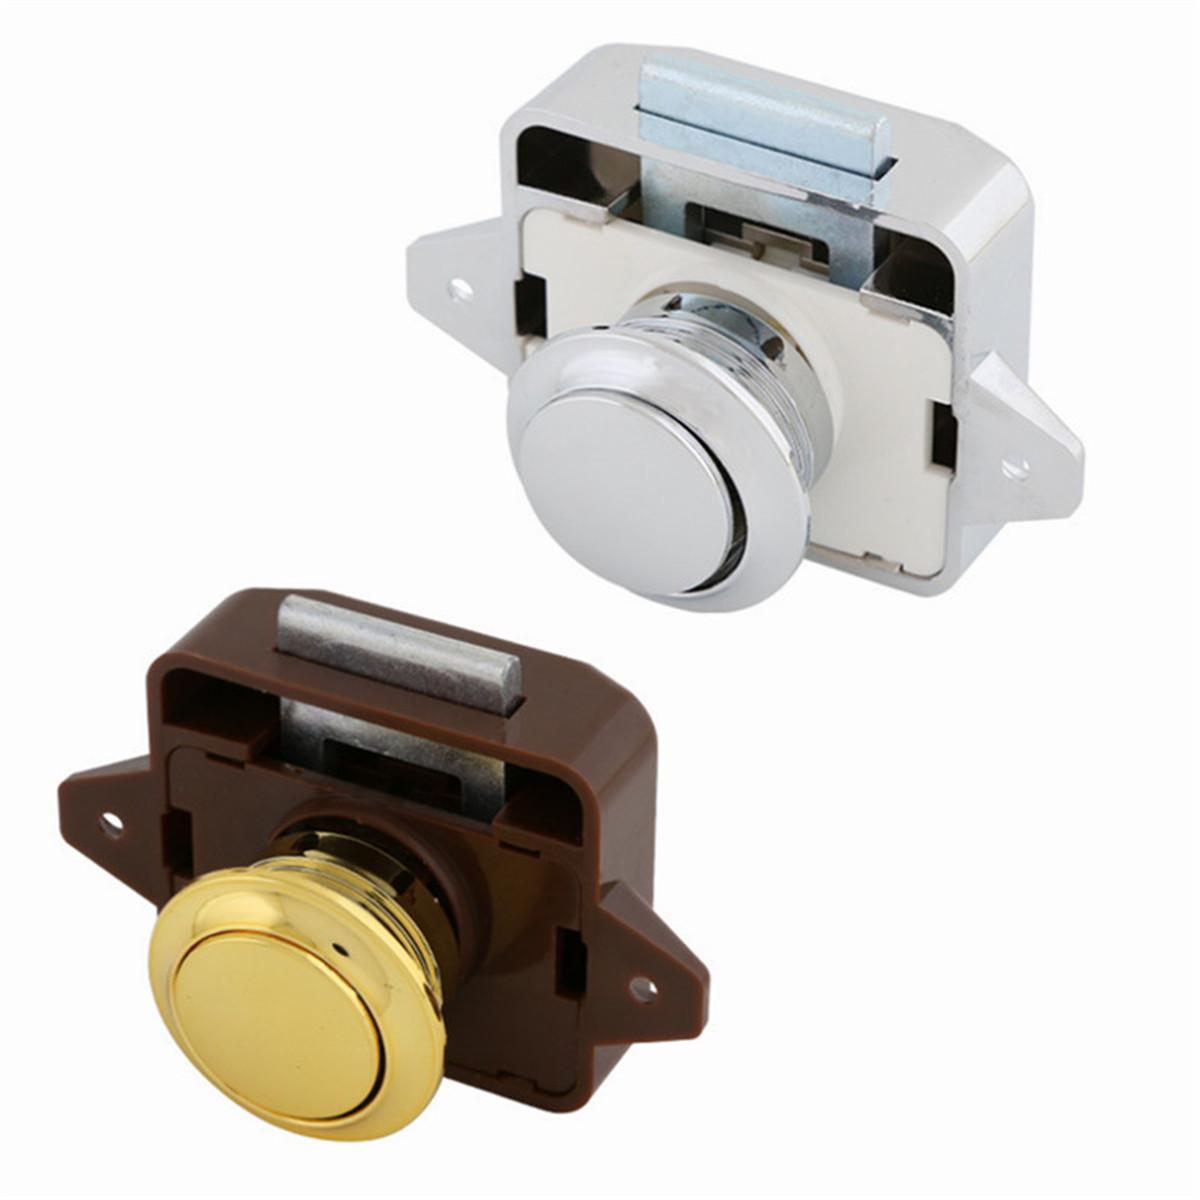 Picture of: Push Button Catch Lock Cupboard Door Motorhome Cabinet Camper Caravan Latch Knob Archives Statelegals Staradvertiser Com